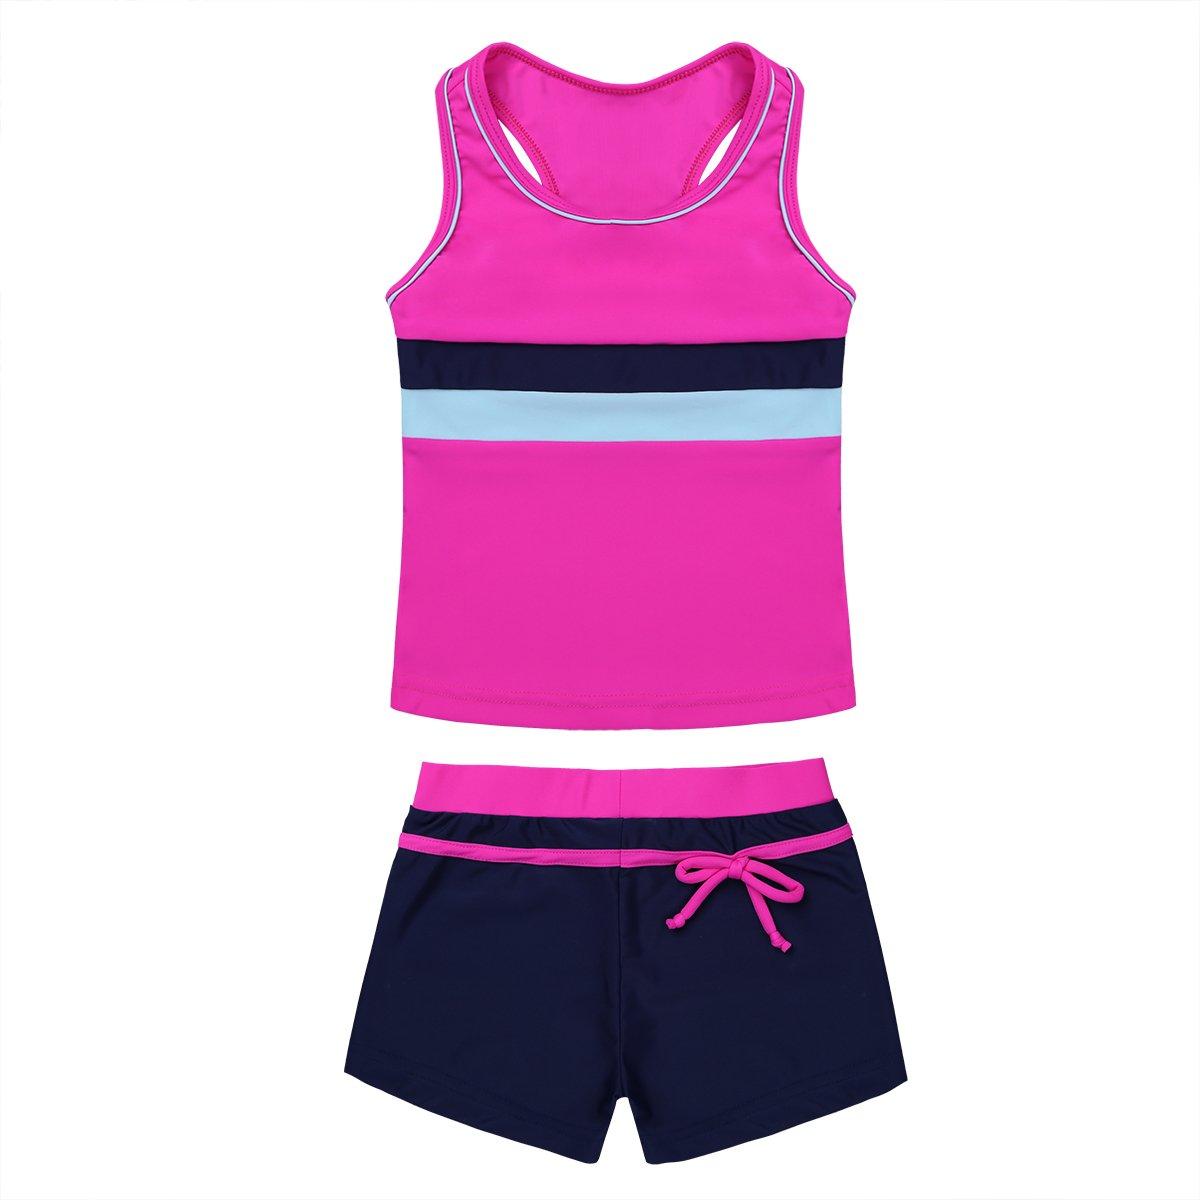 iiniim Big Girls Two Piece Halter Tankini Swimsuit Tank Top with Boyshort Sets Summer Beach Bathing Suit Rose&Navy 10